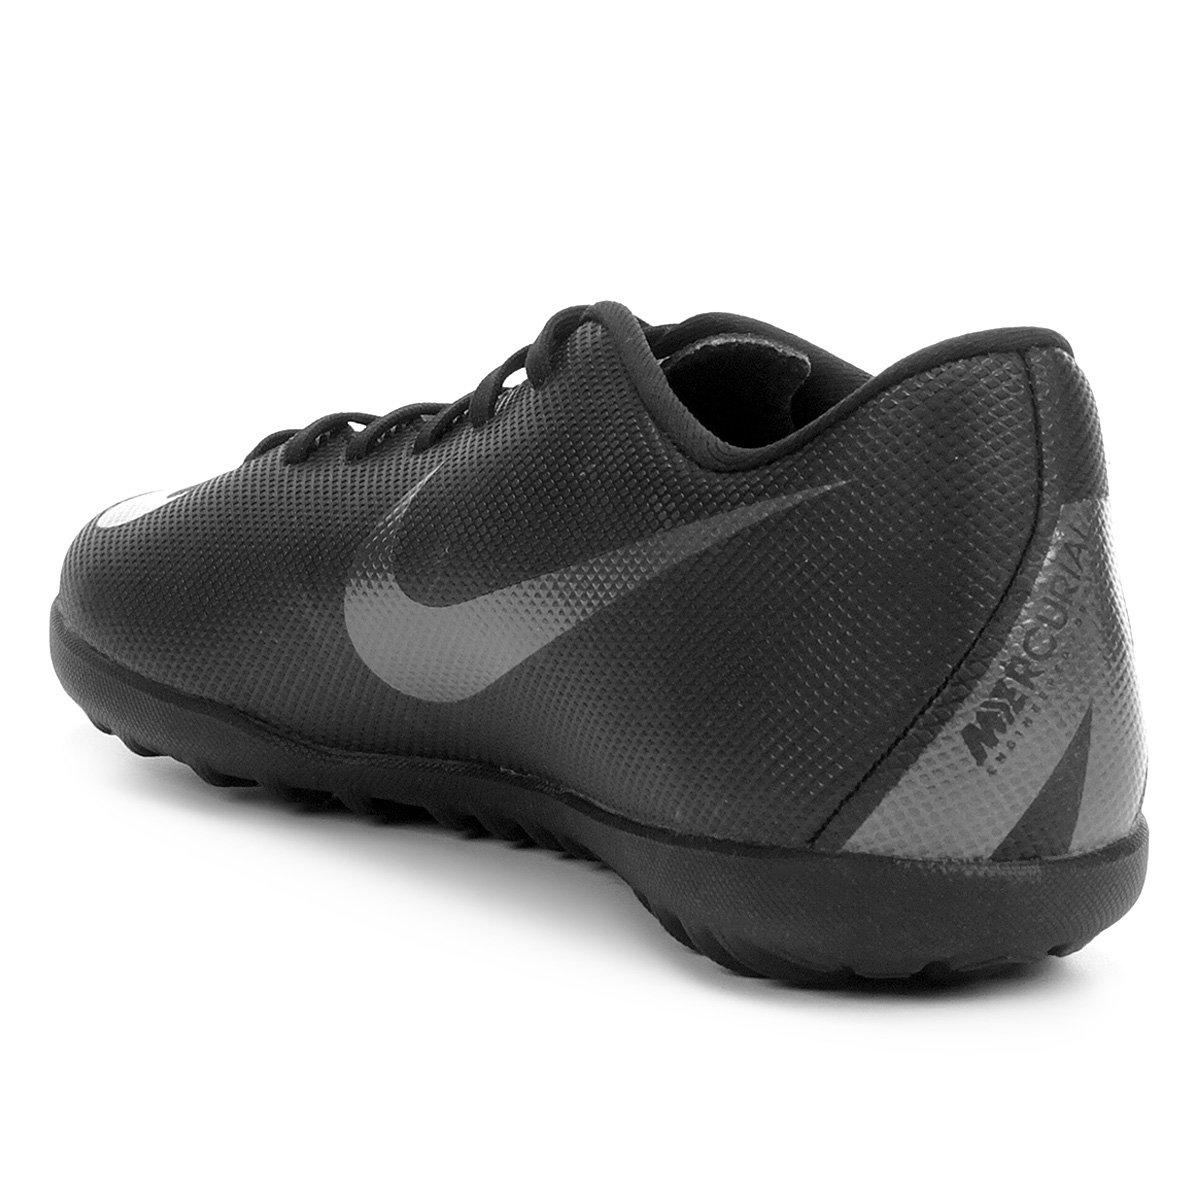 d698bf2fe8 Chuteira Nike Society Mercurial Vapor 12 Club - Preto - Compre Agora ...